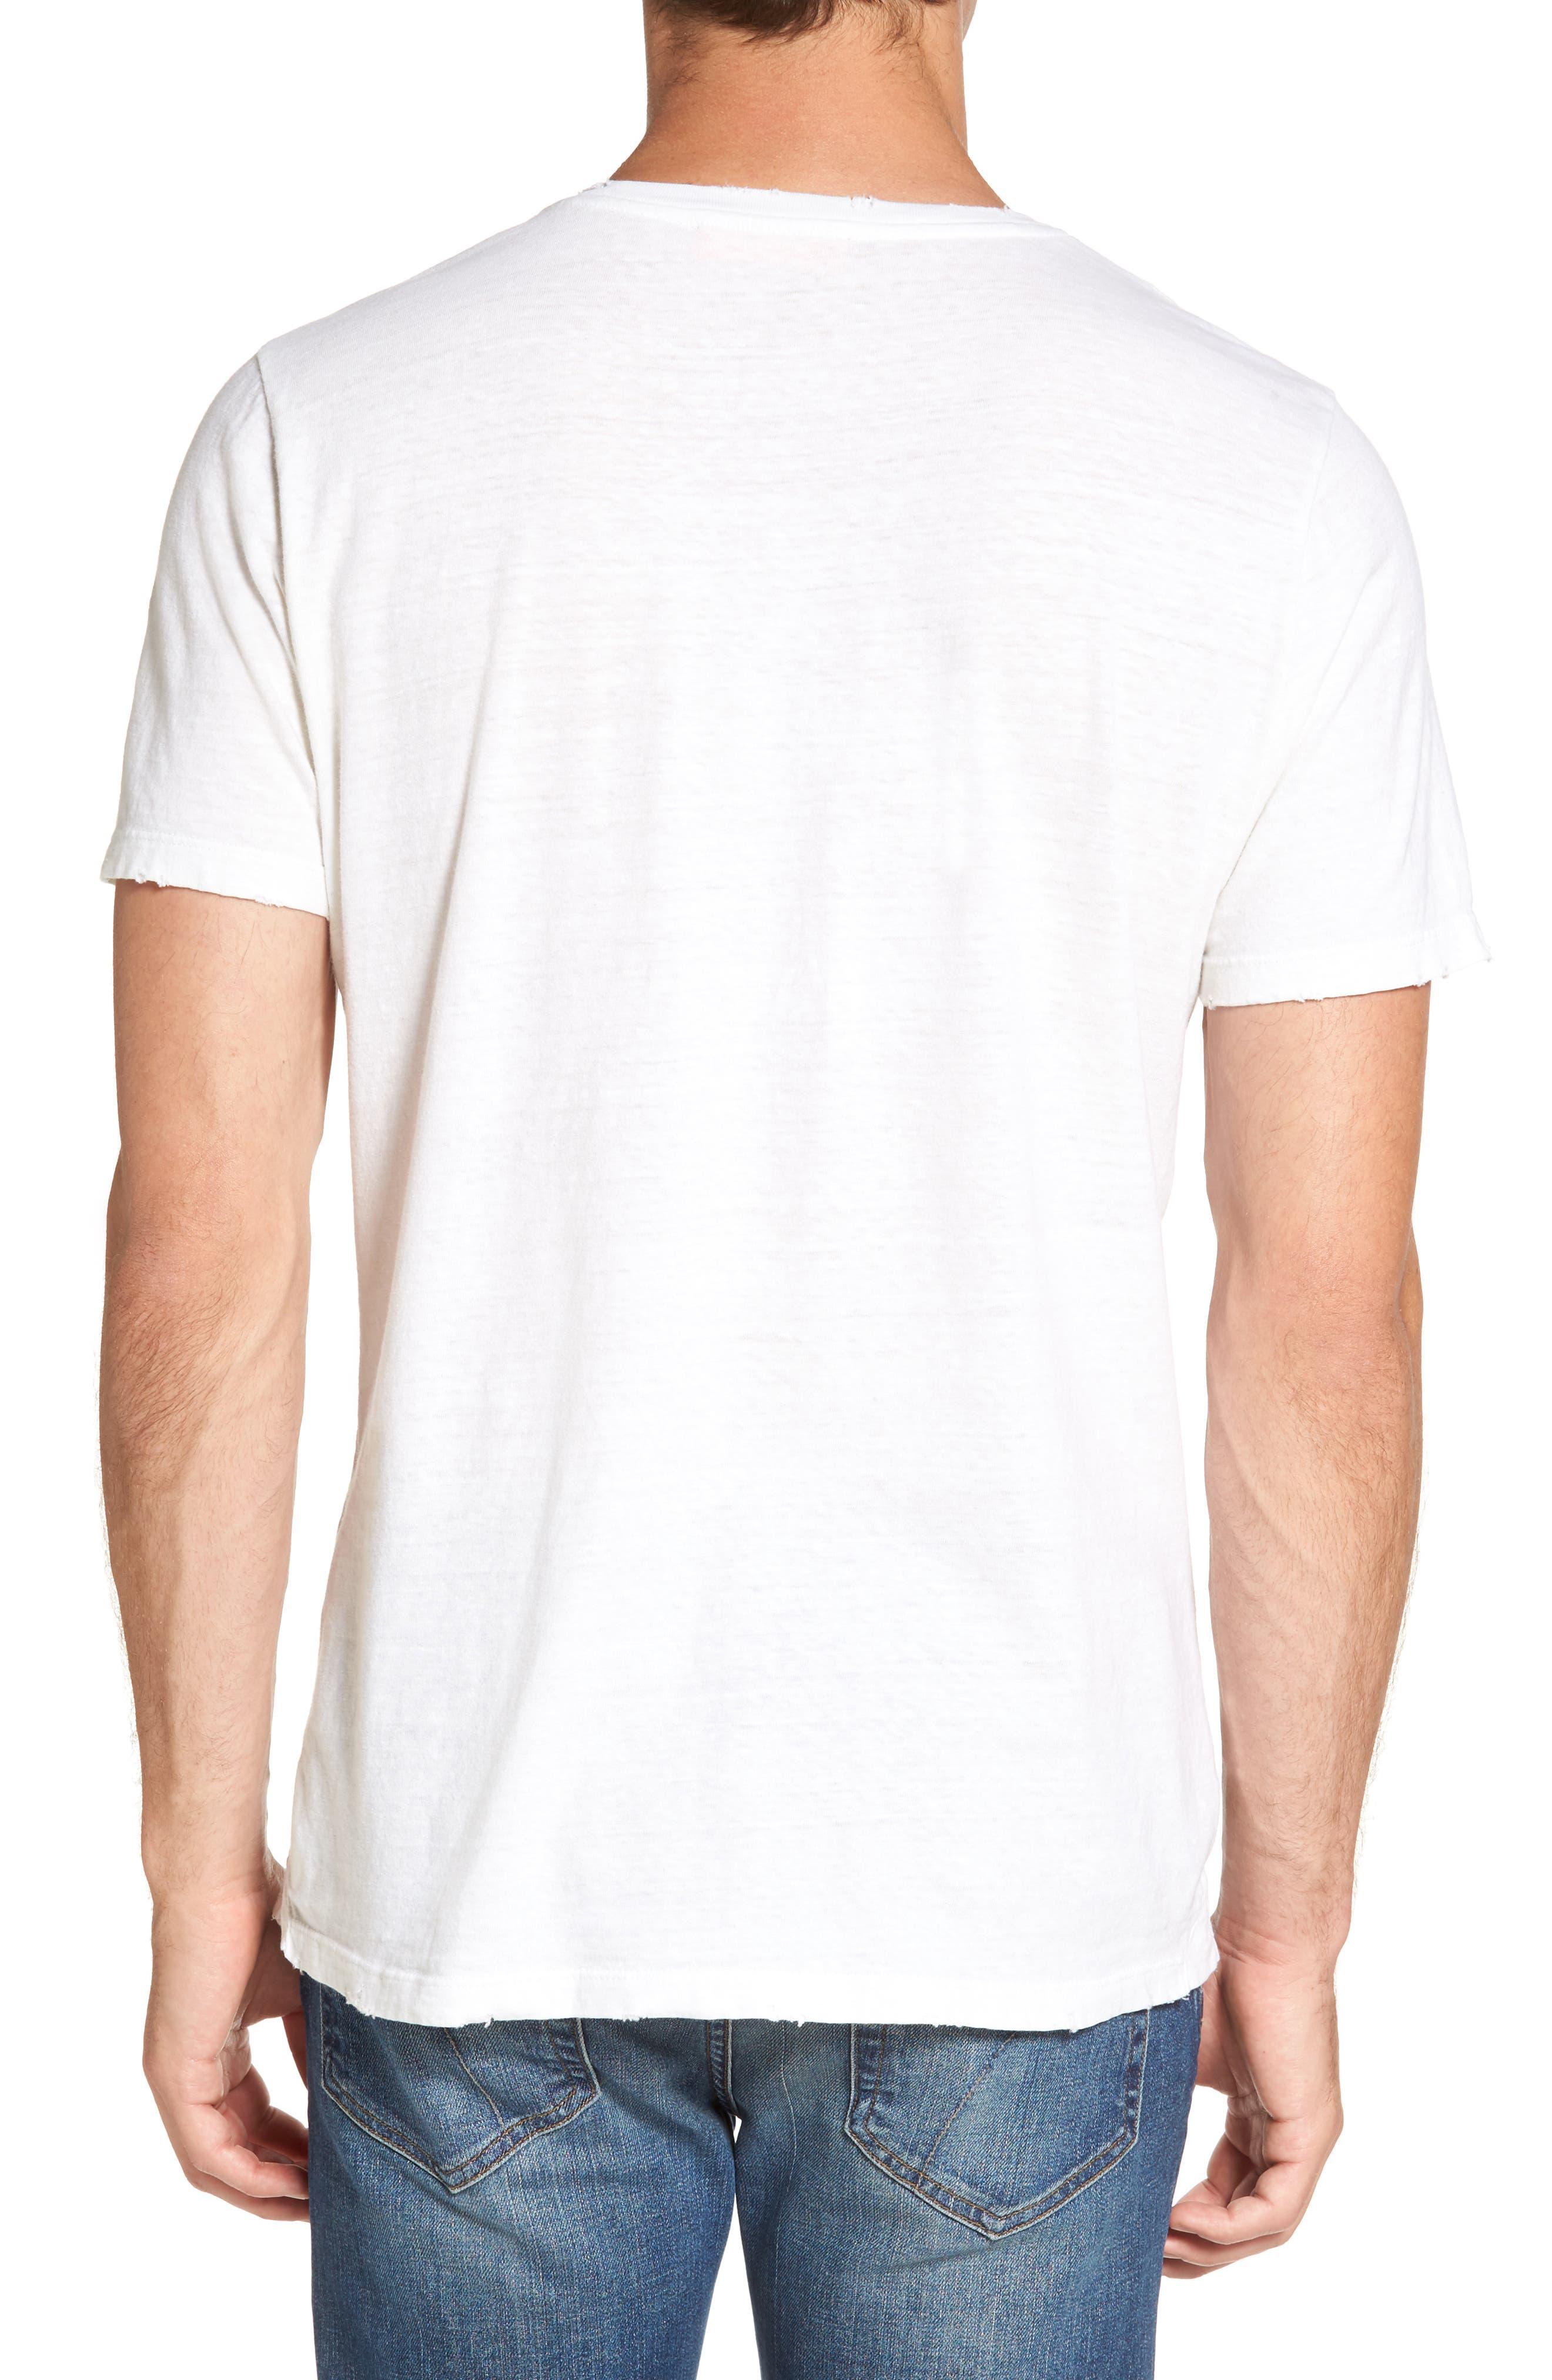 Bronco 6 T-Shirt,                             Alternate thumbnail 2, color,                             Blanc